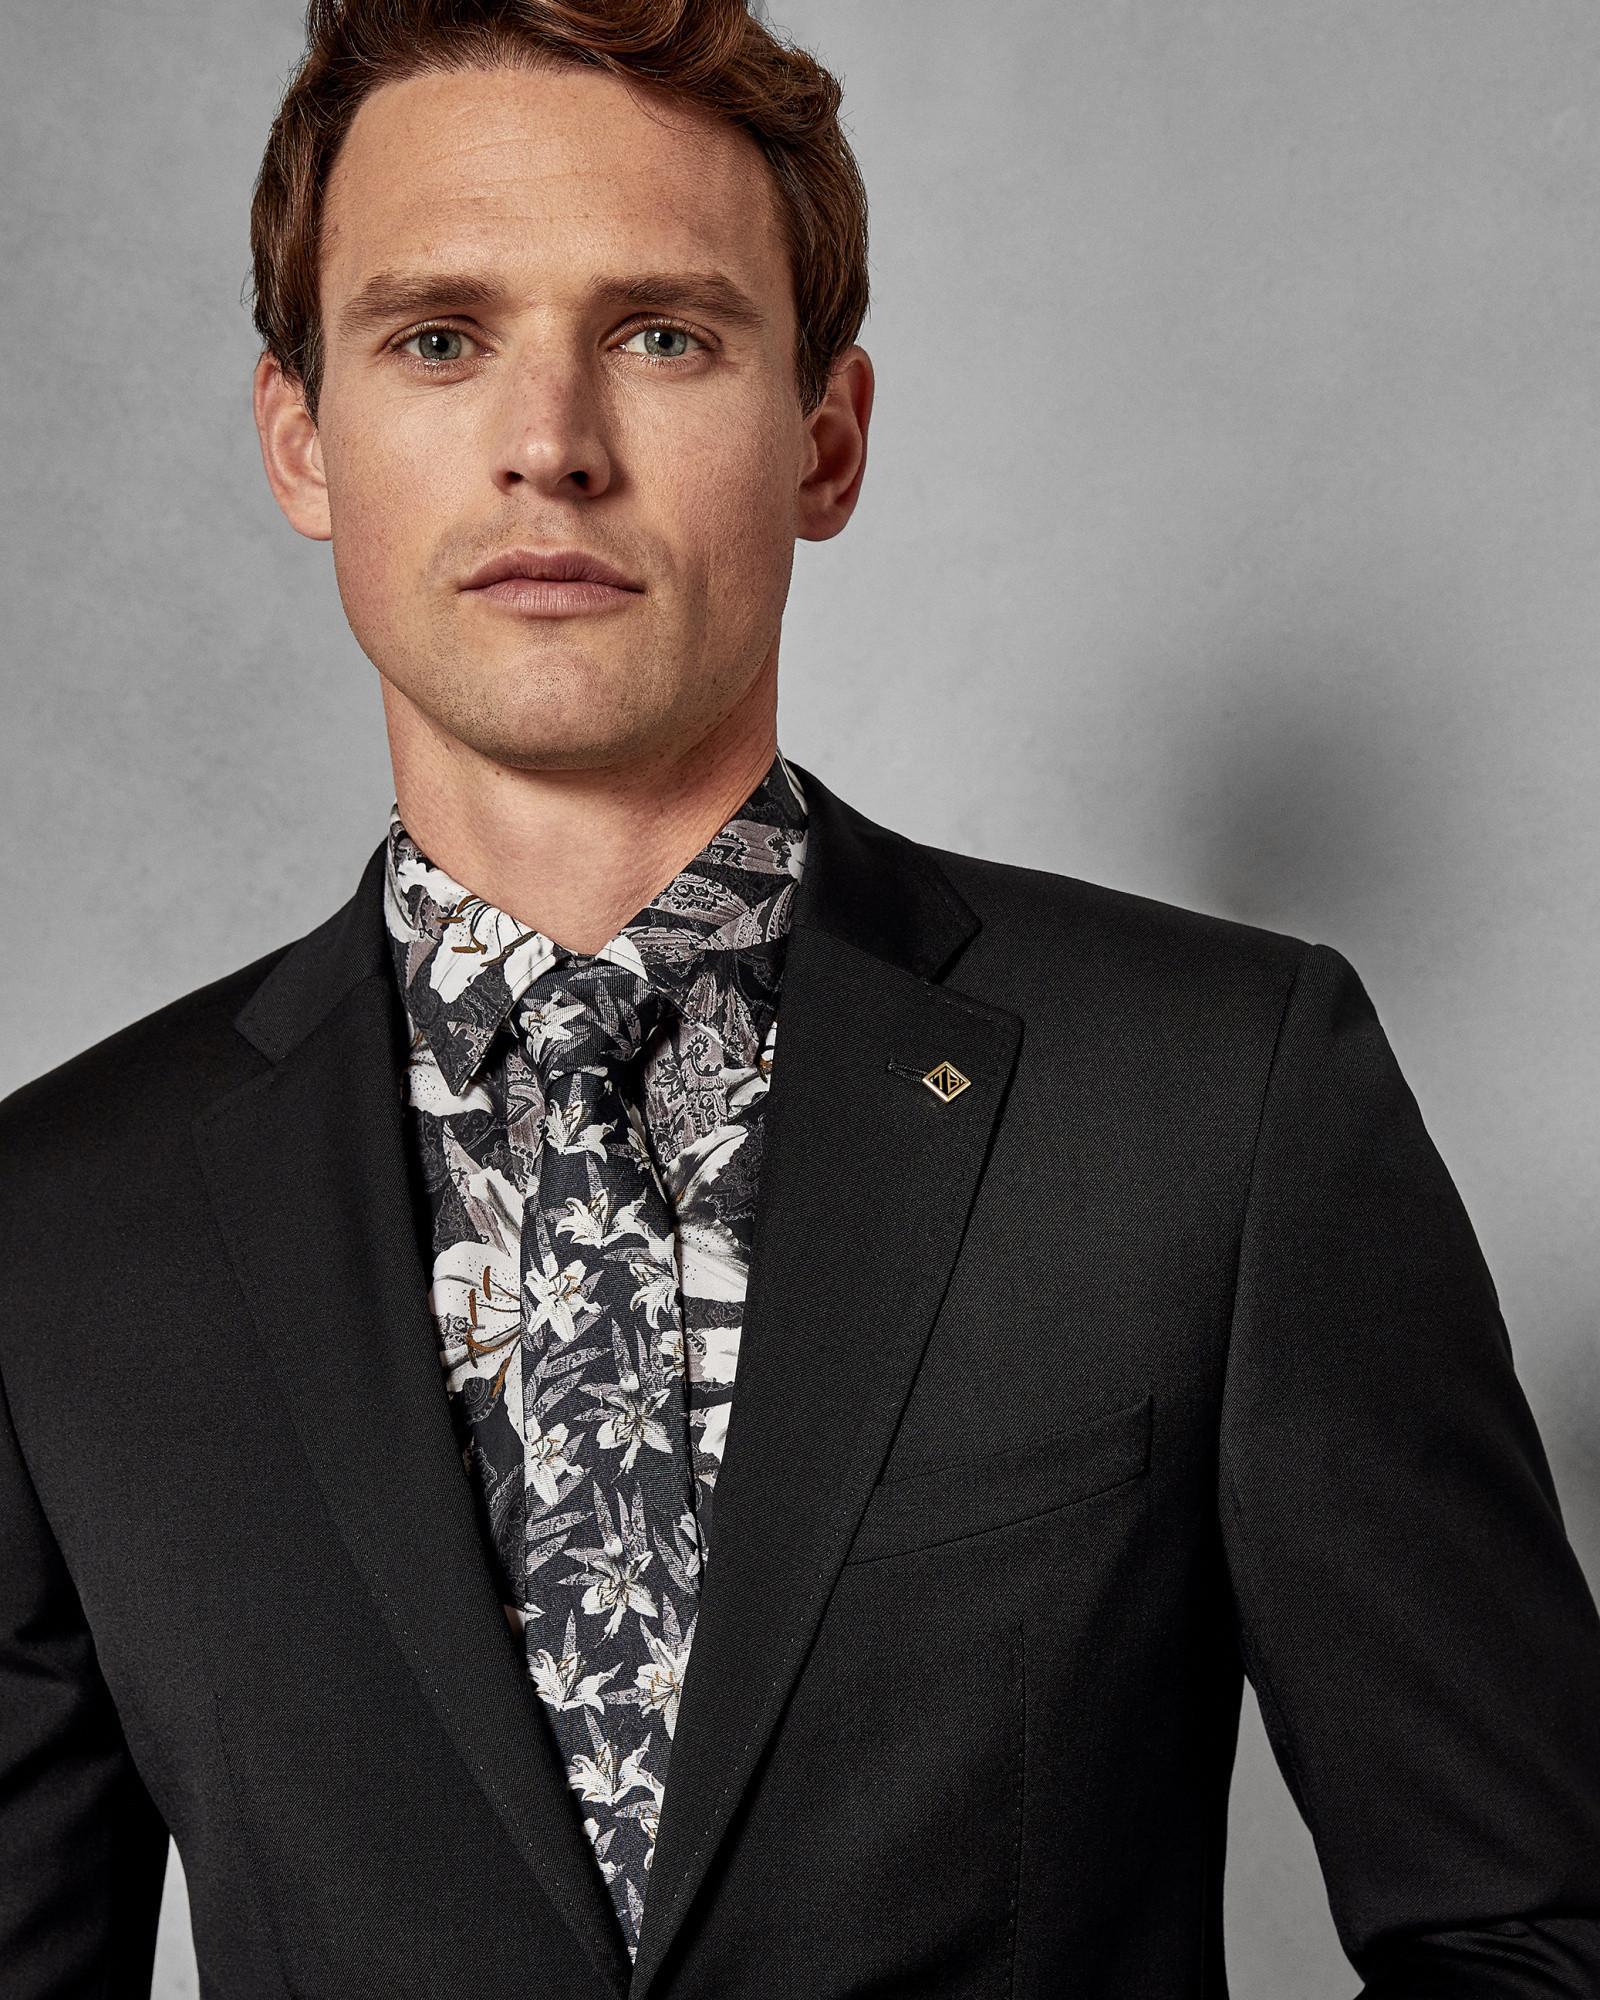 c3e9a0e45 Ted Baker Debonair Plain Wool Suit Jacket in Black for Men - Lyst